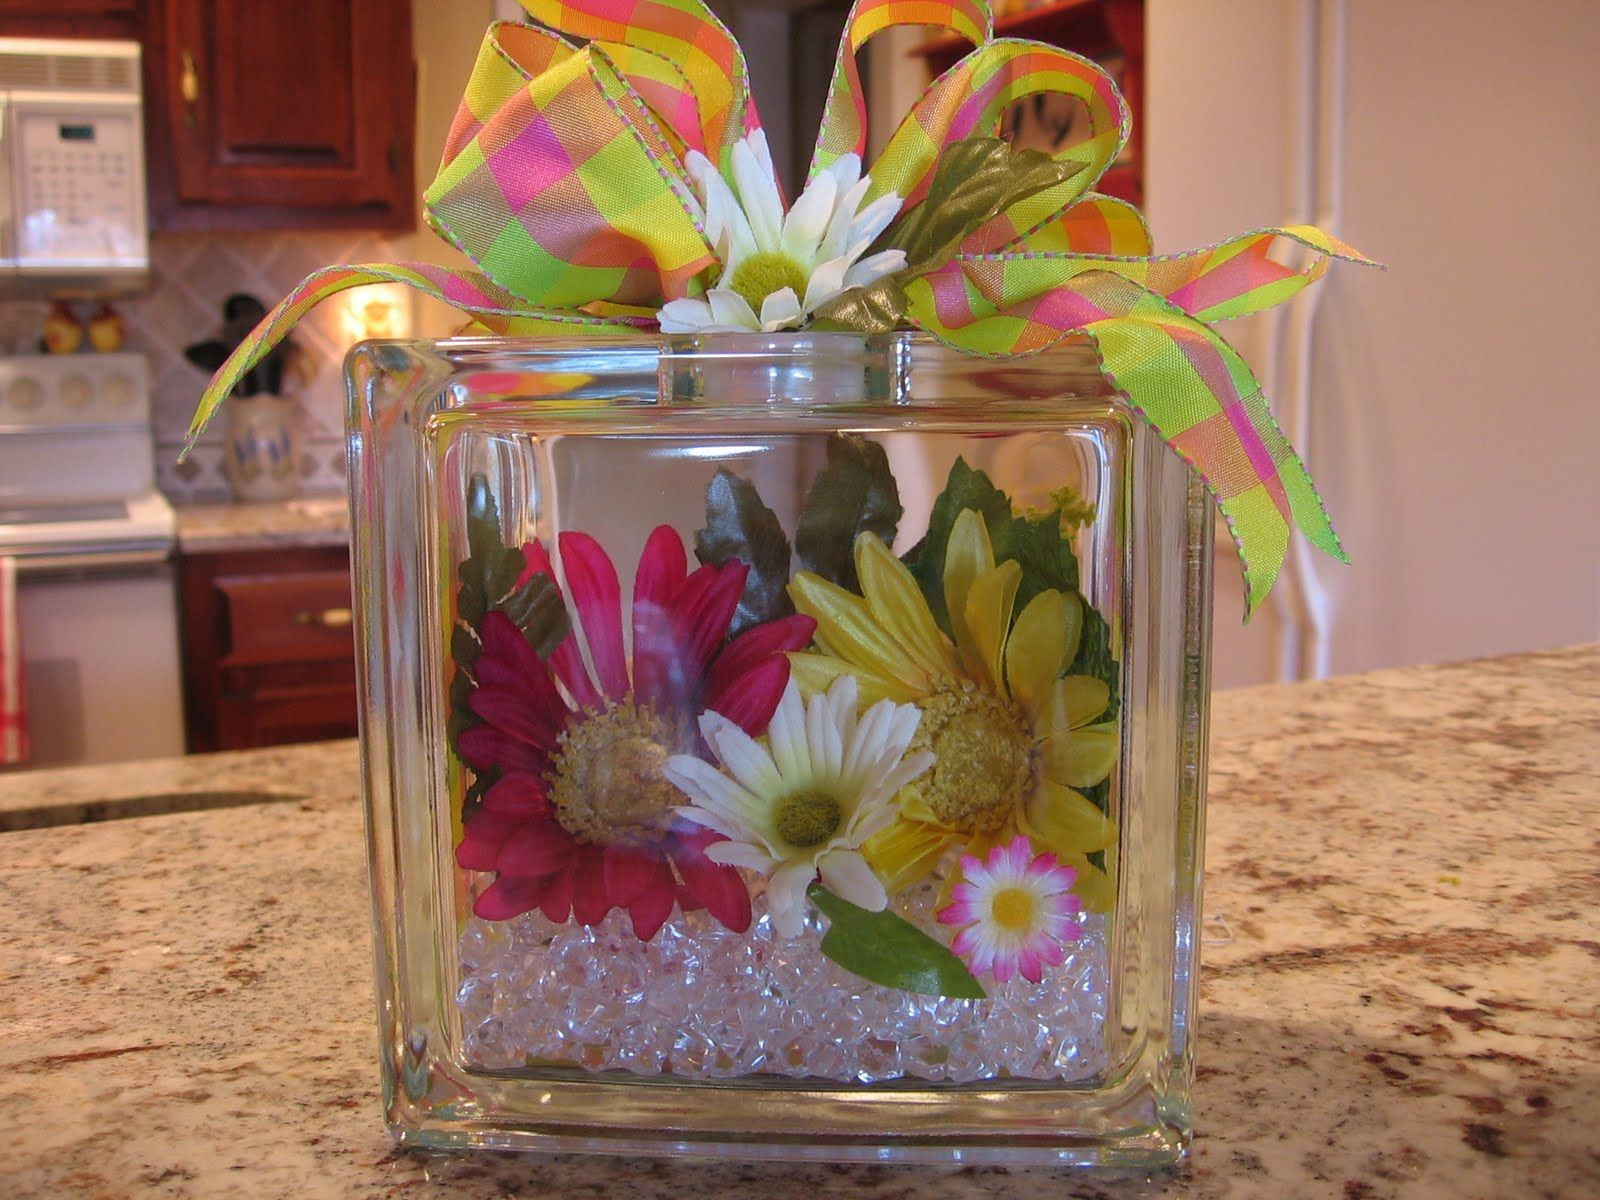 Ideas To Decorate Glass Bottles 265 Best Glass Block Ideas Images On Pinterest  Glass Block